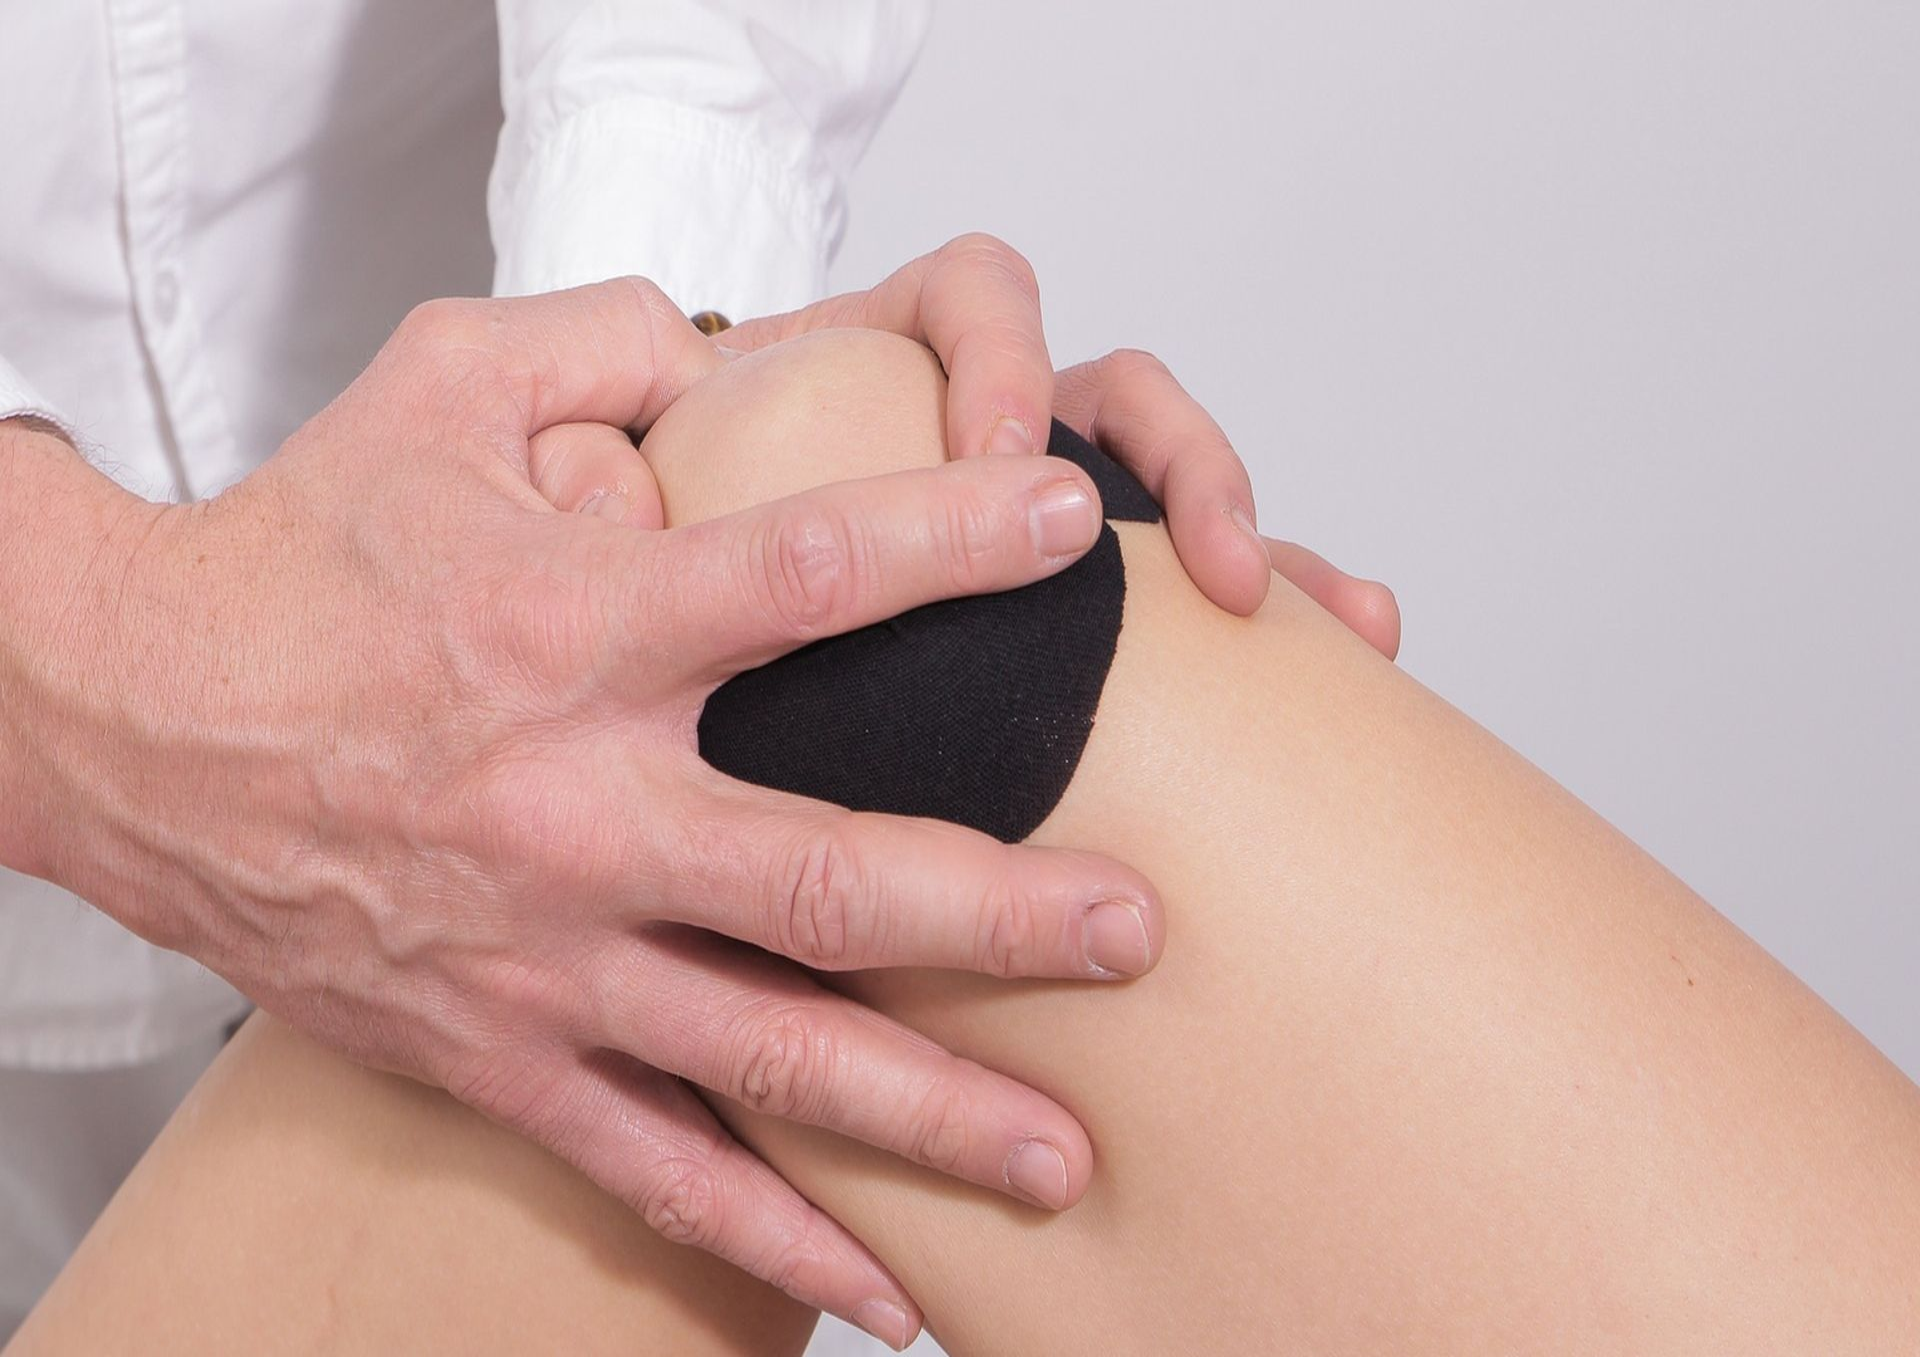 reteta de tratament a genunchiului bunicii